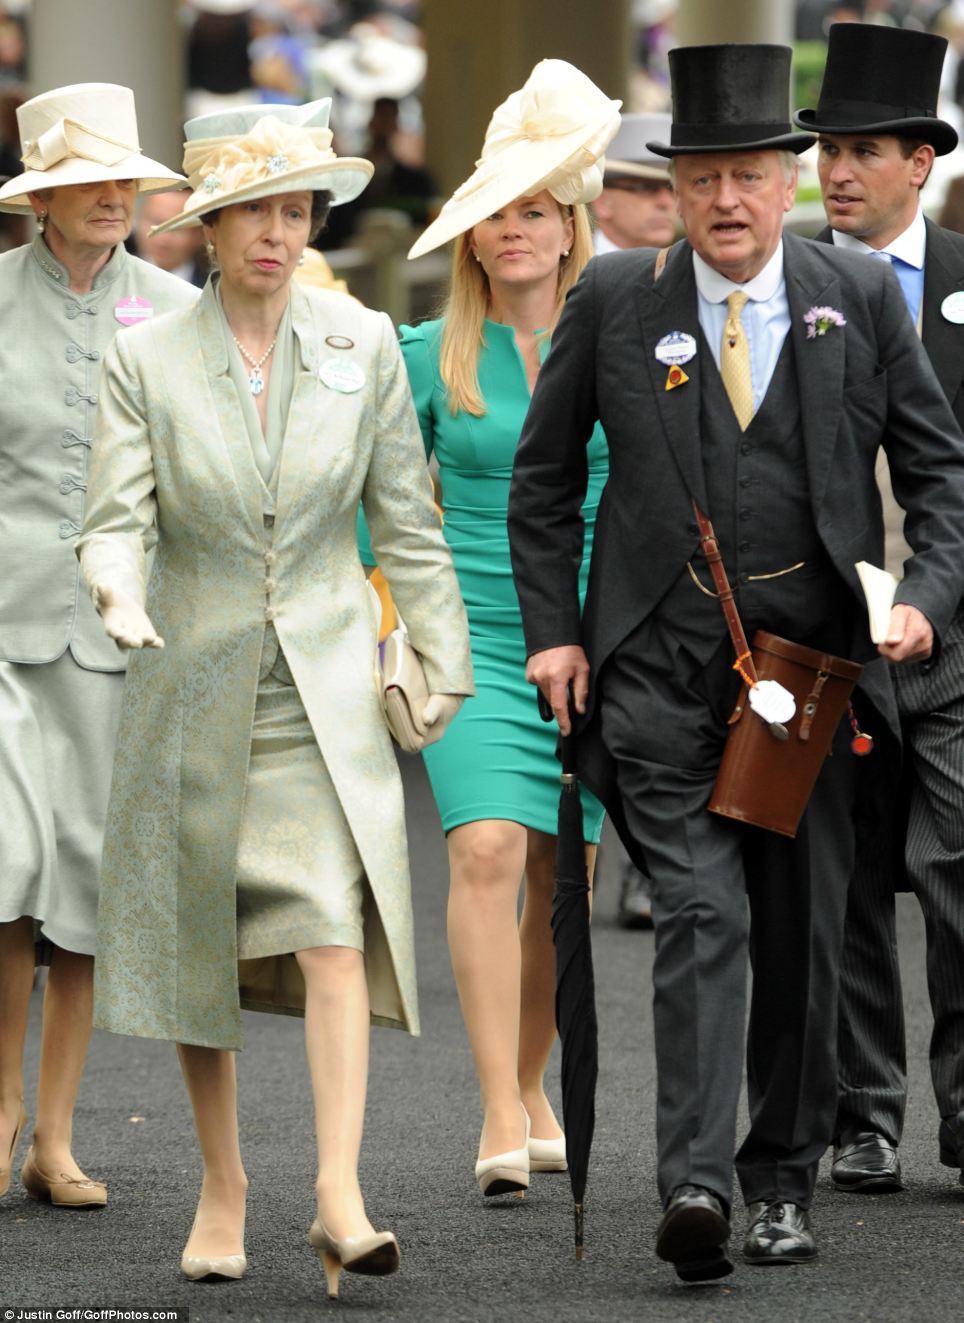 Princess Anne and Autumn Phillips walk through the enclosure